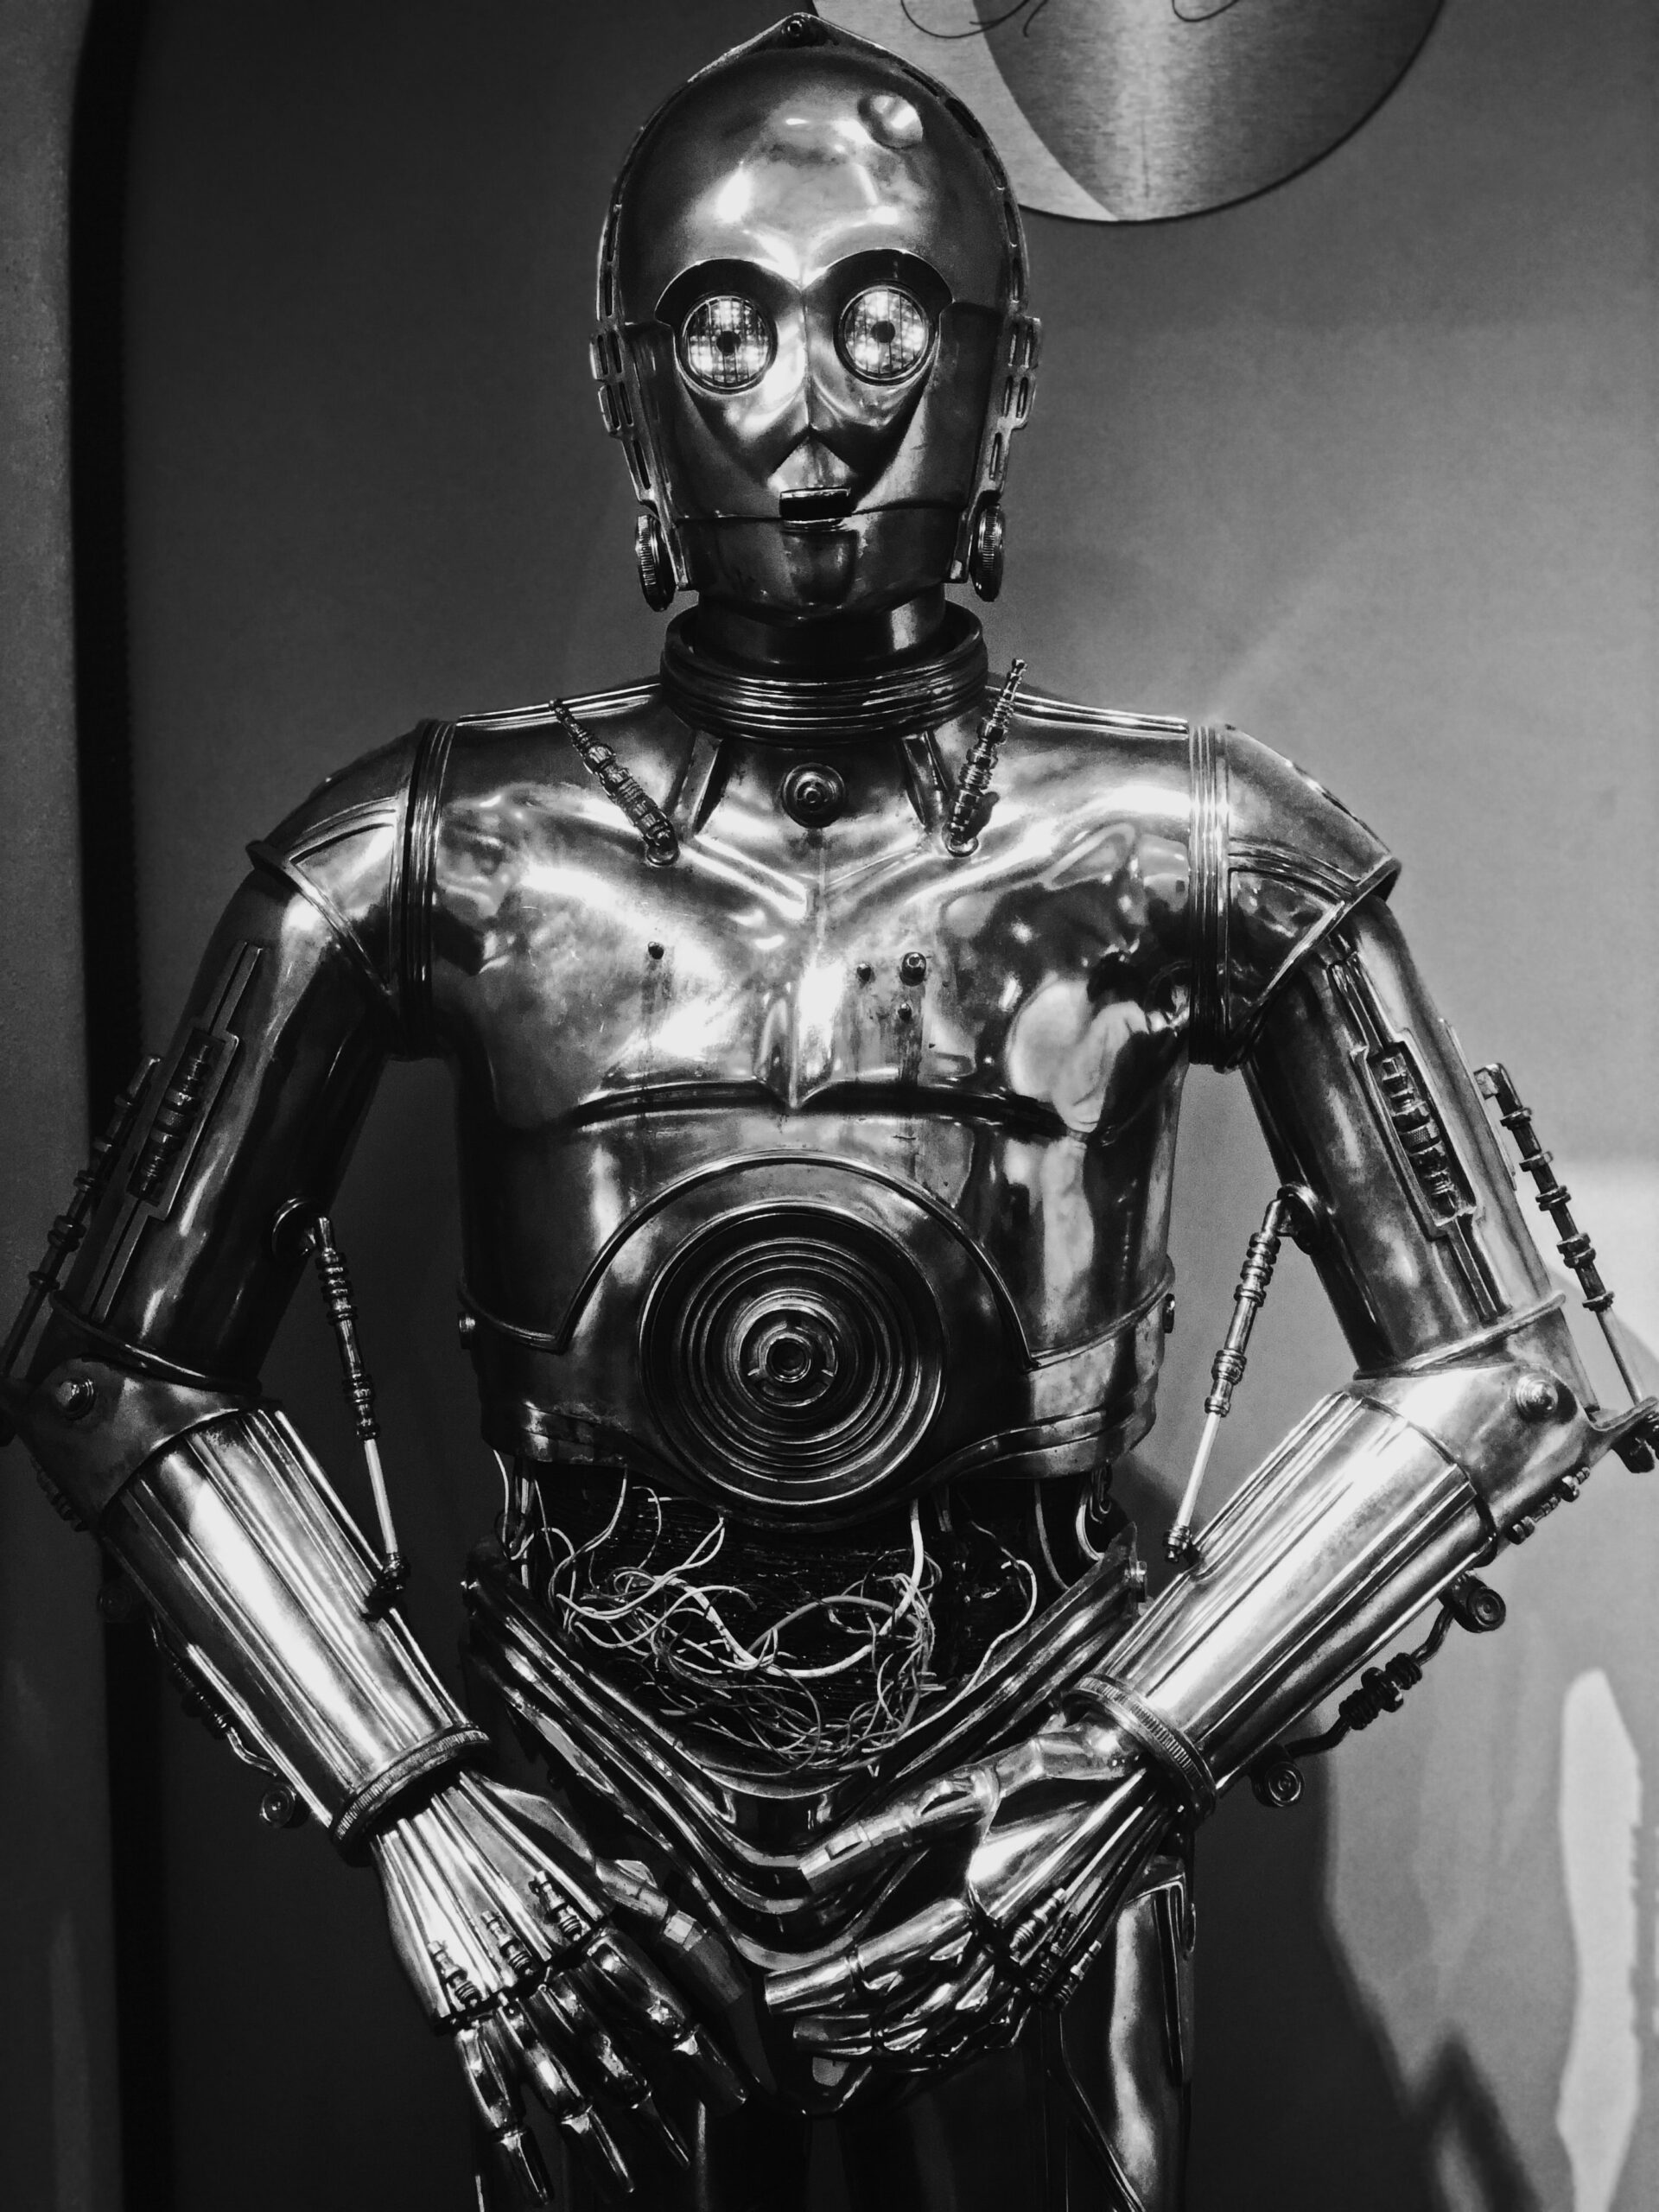 C-3PO by Nice M Nshuti on Unsplash